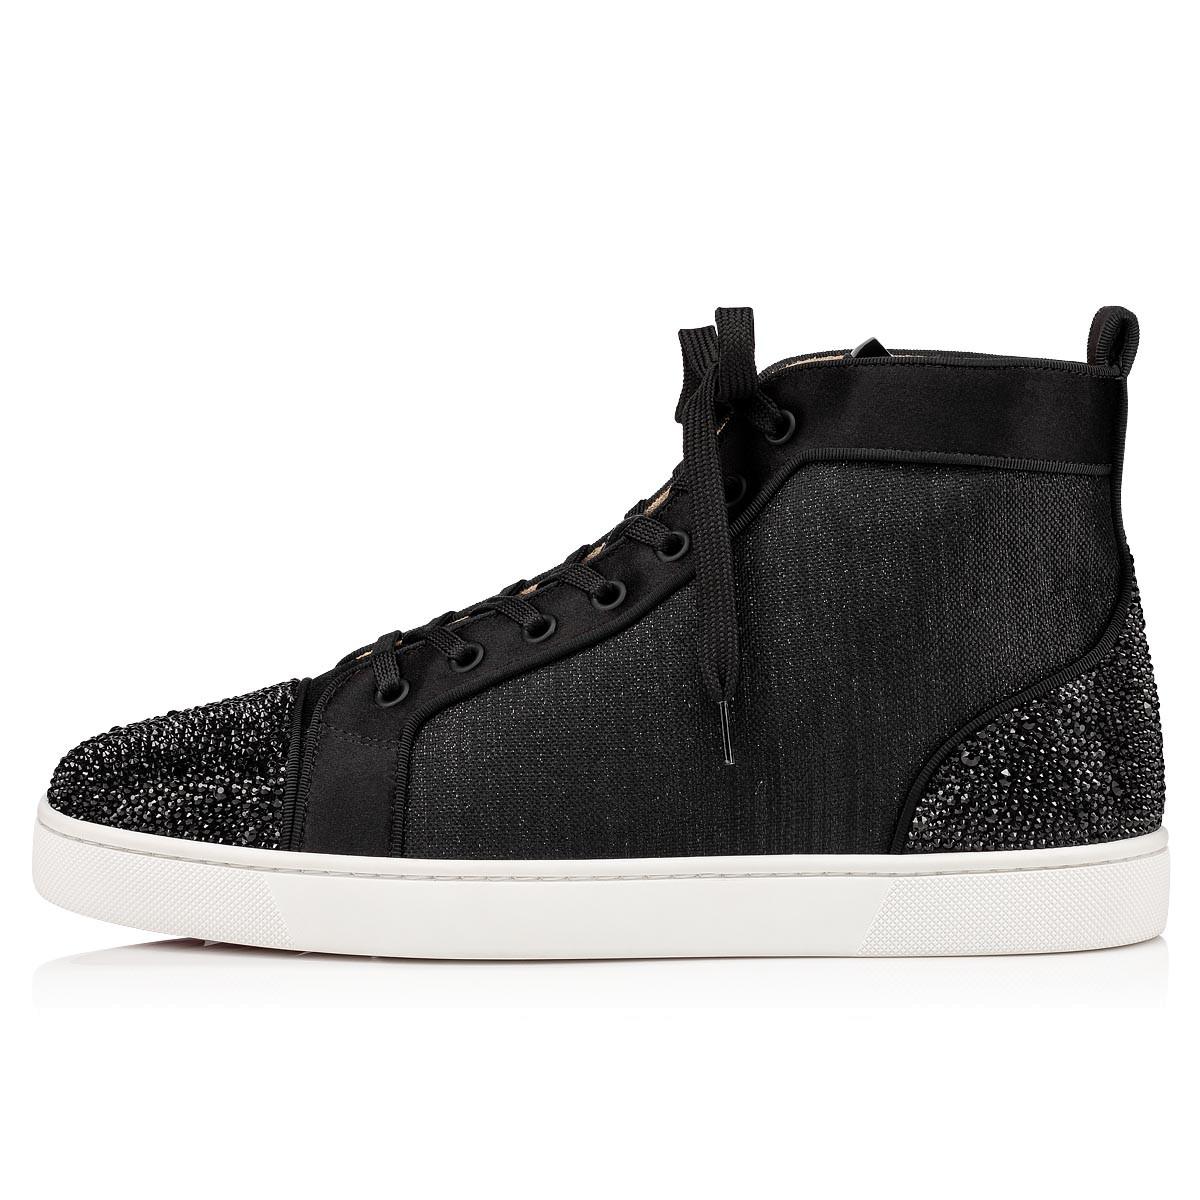 Shoes - Louis P Strass II Flat - Christian Louboutin